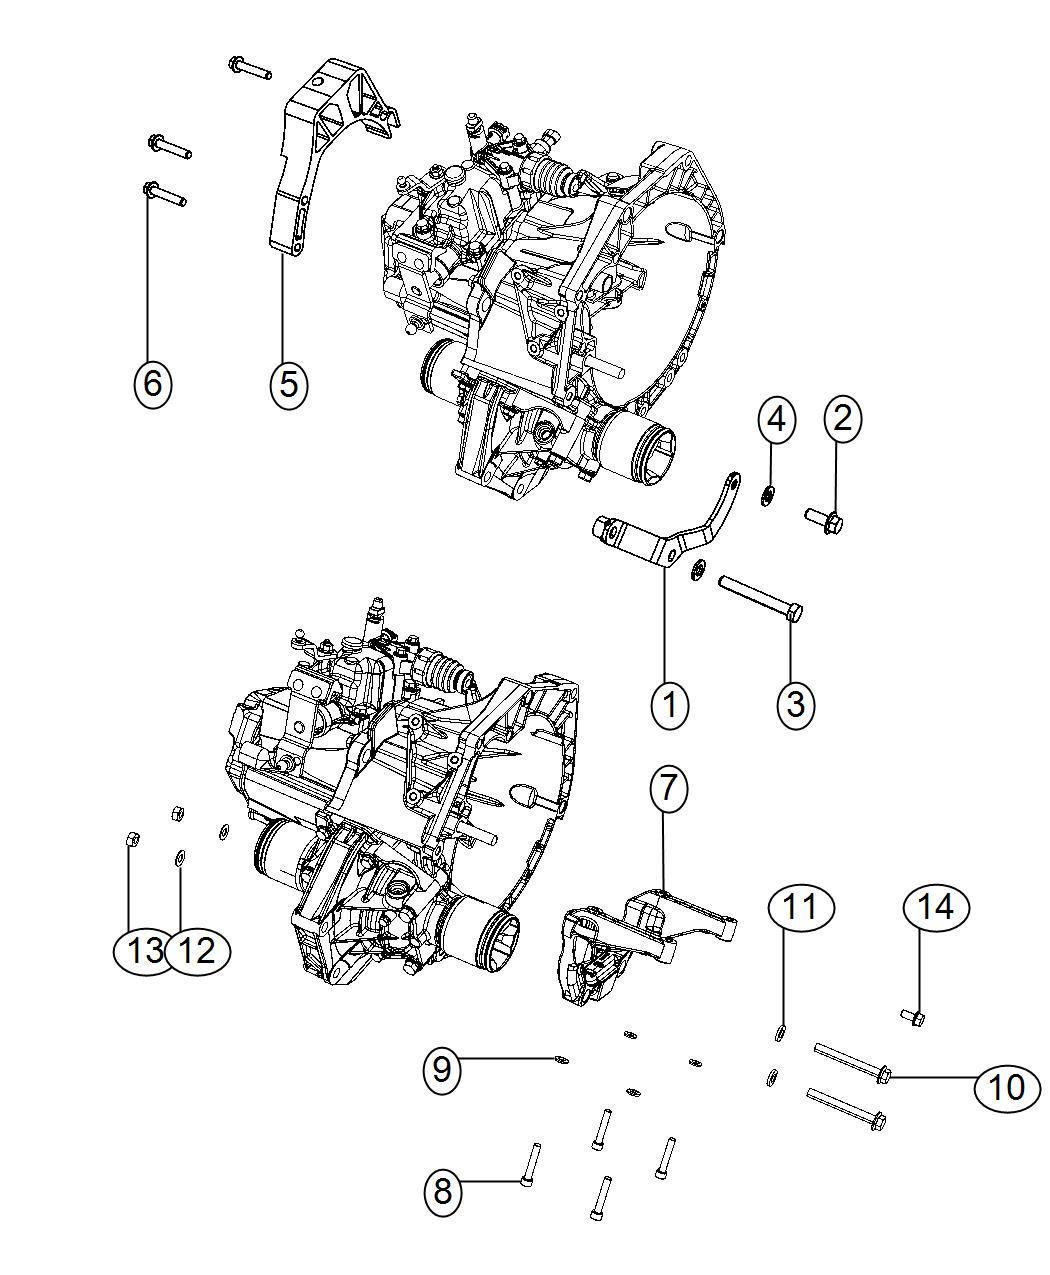 Fiat 500 Bracket. Differential. Manual, transmission, spd